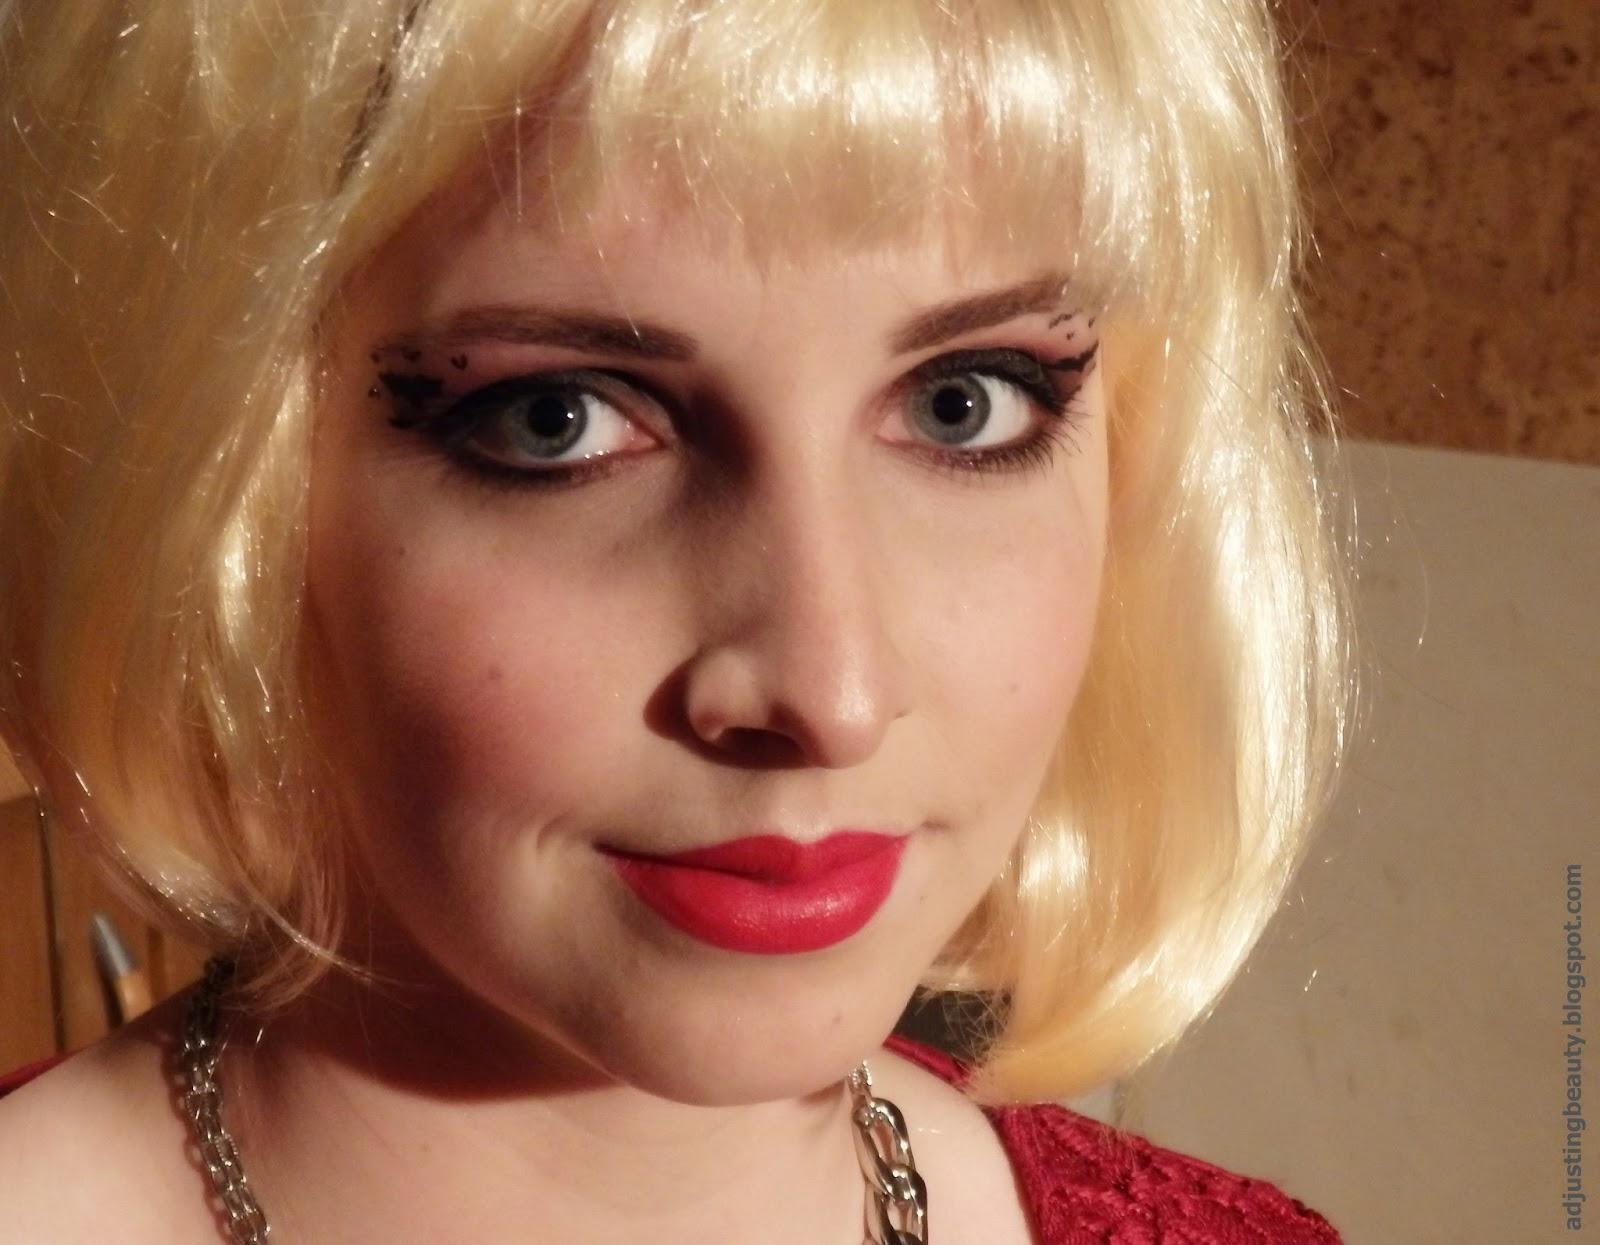 jemma kidd makeup secrets pdf download